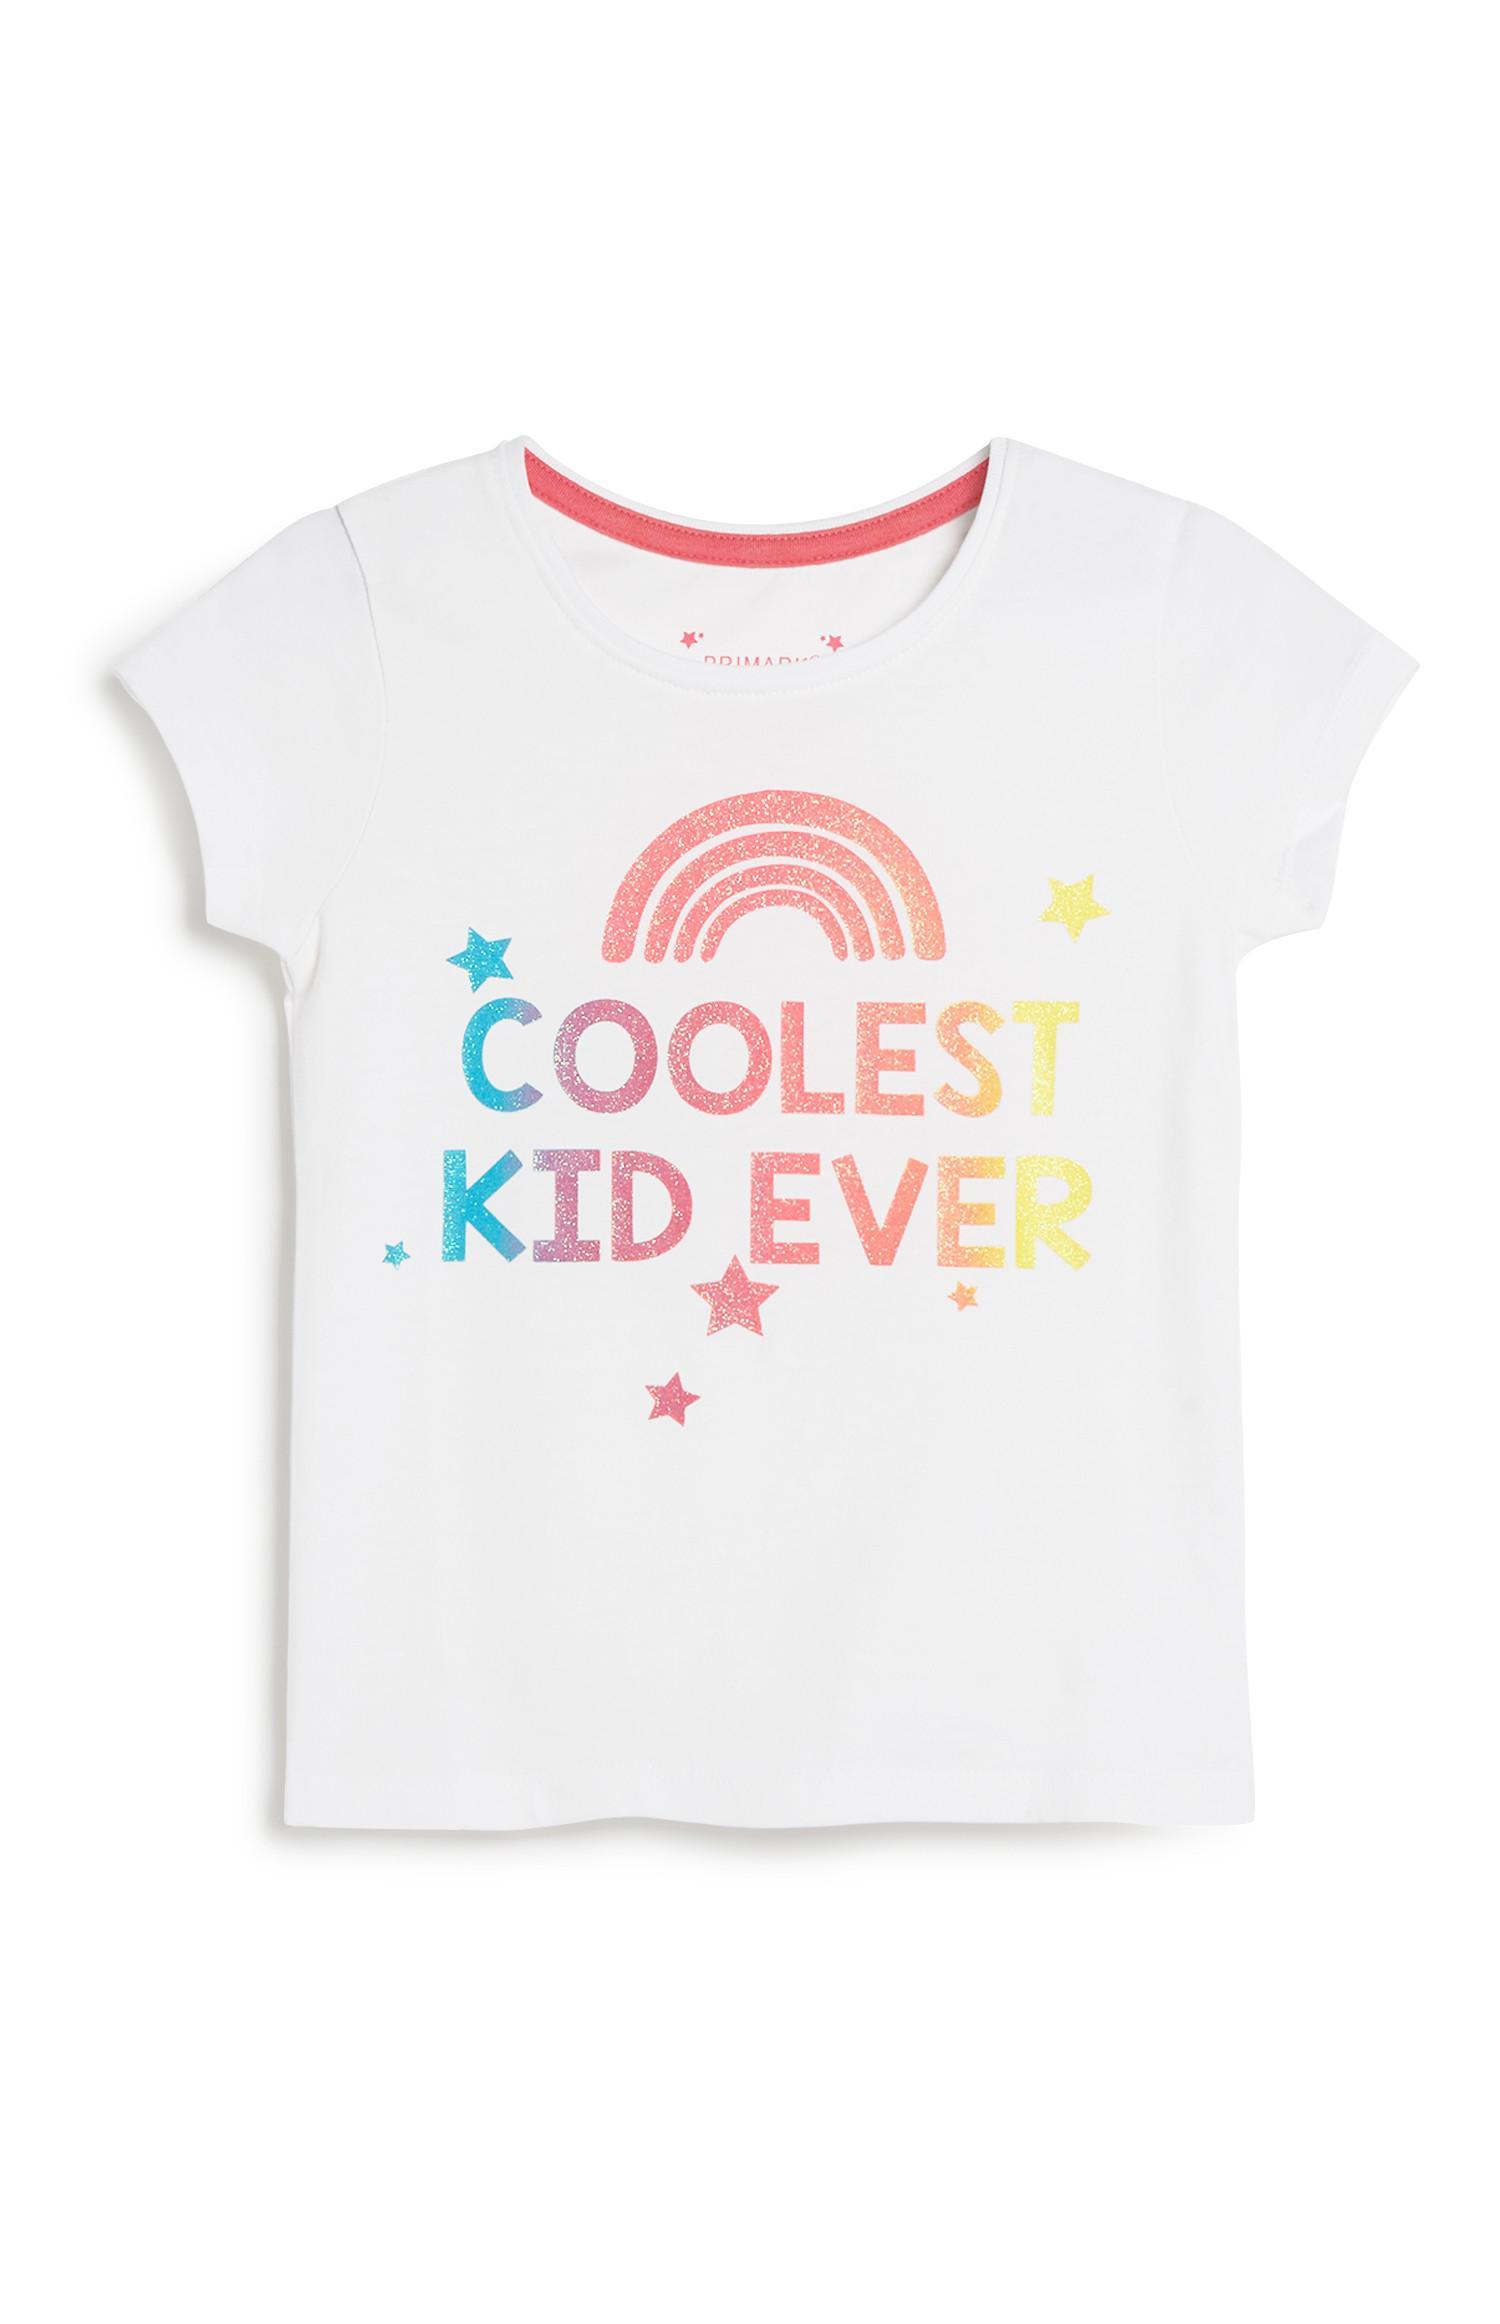 T-shirt met tekst, meisjes